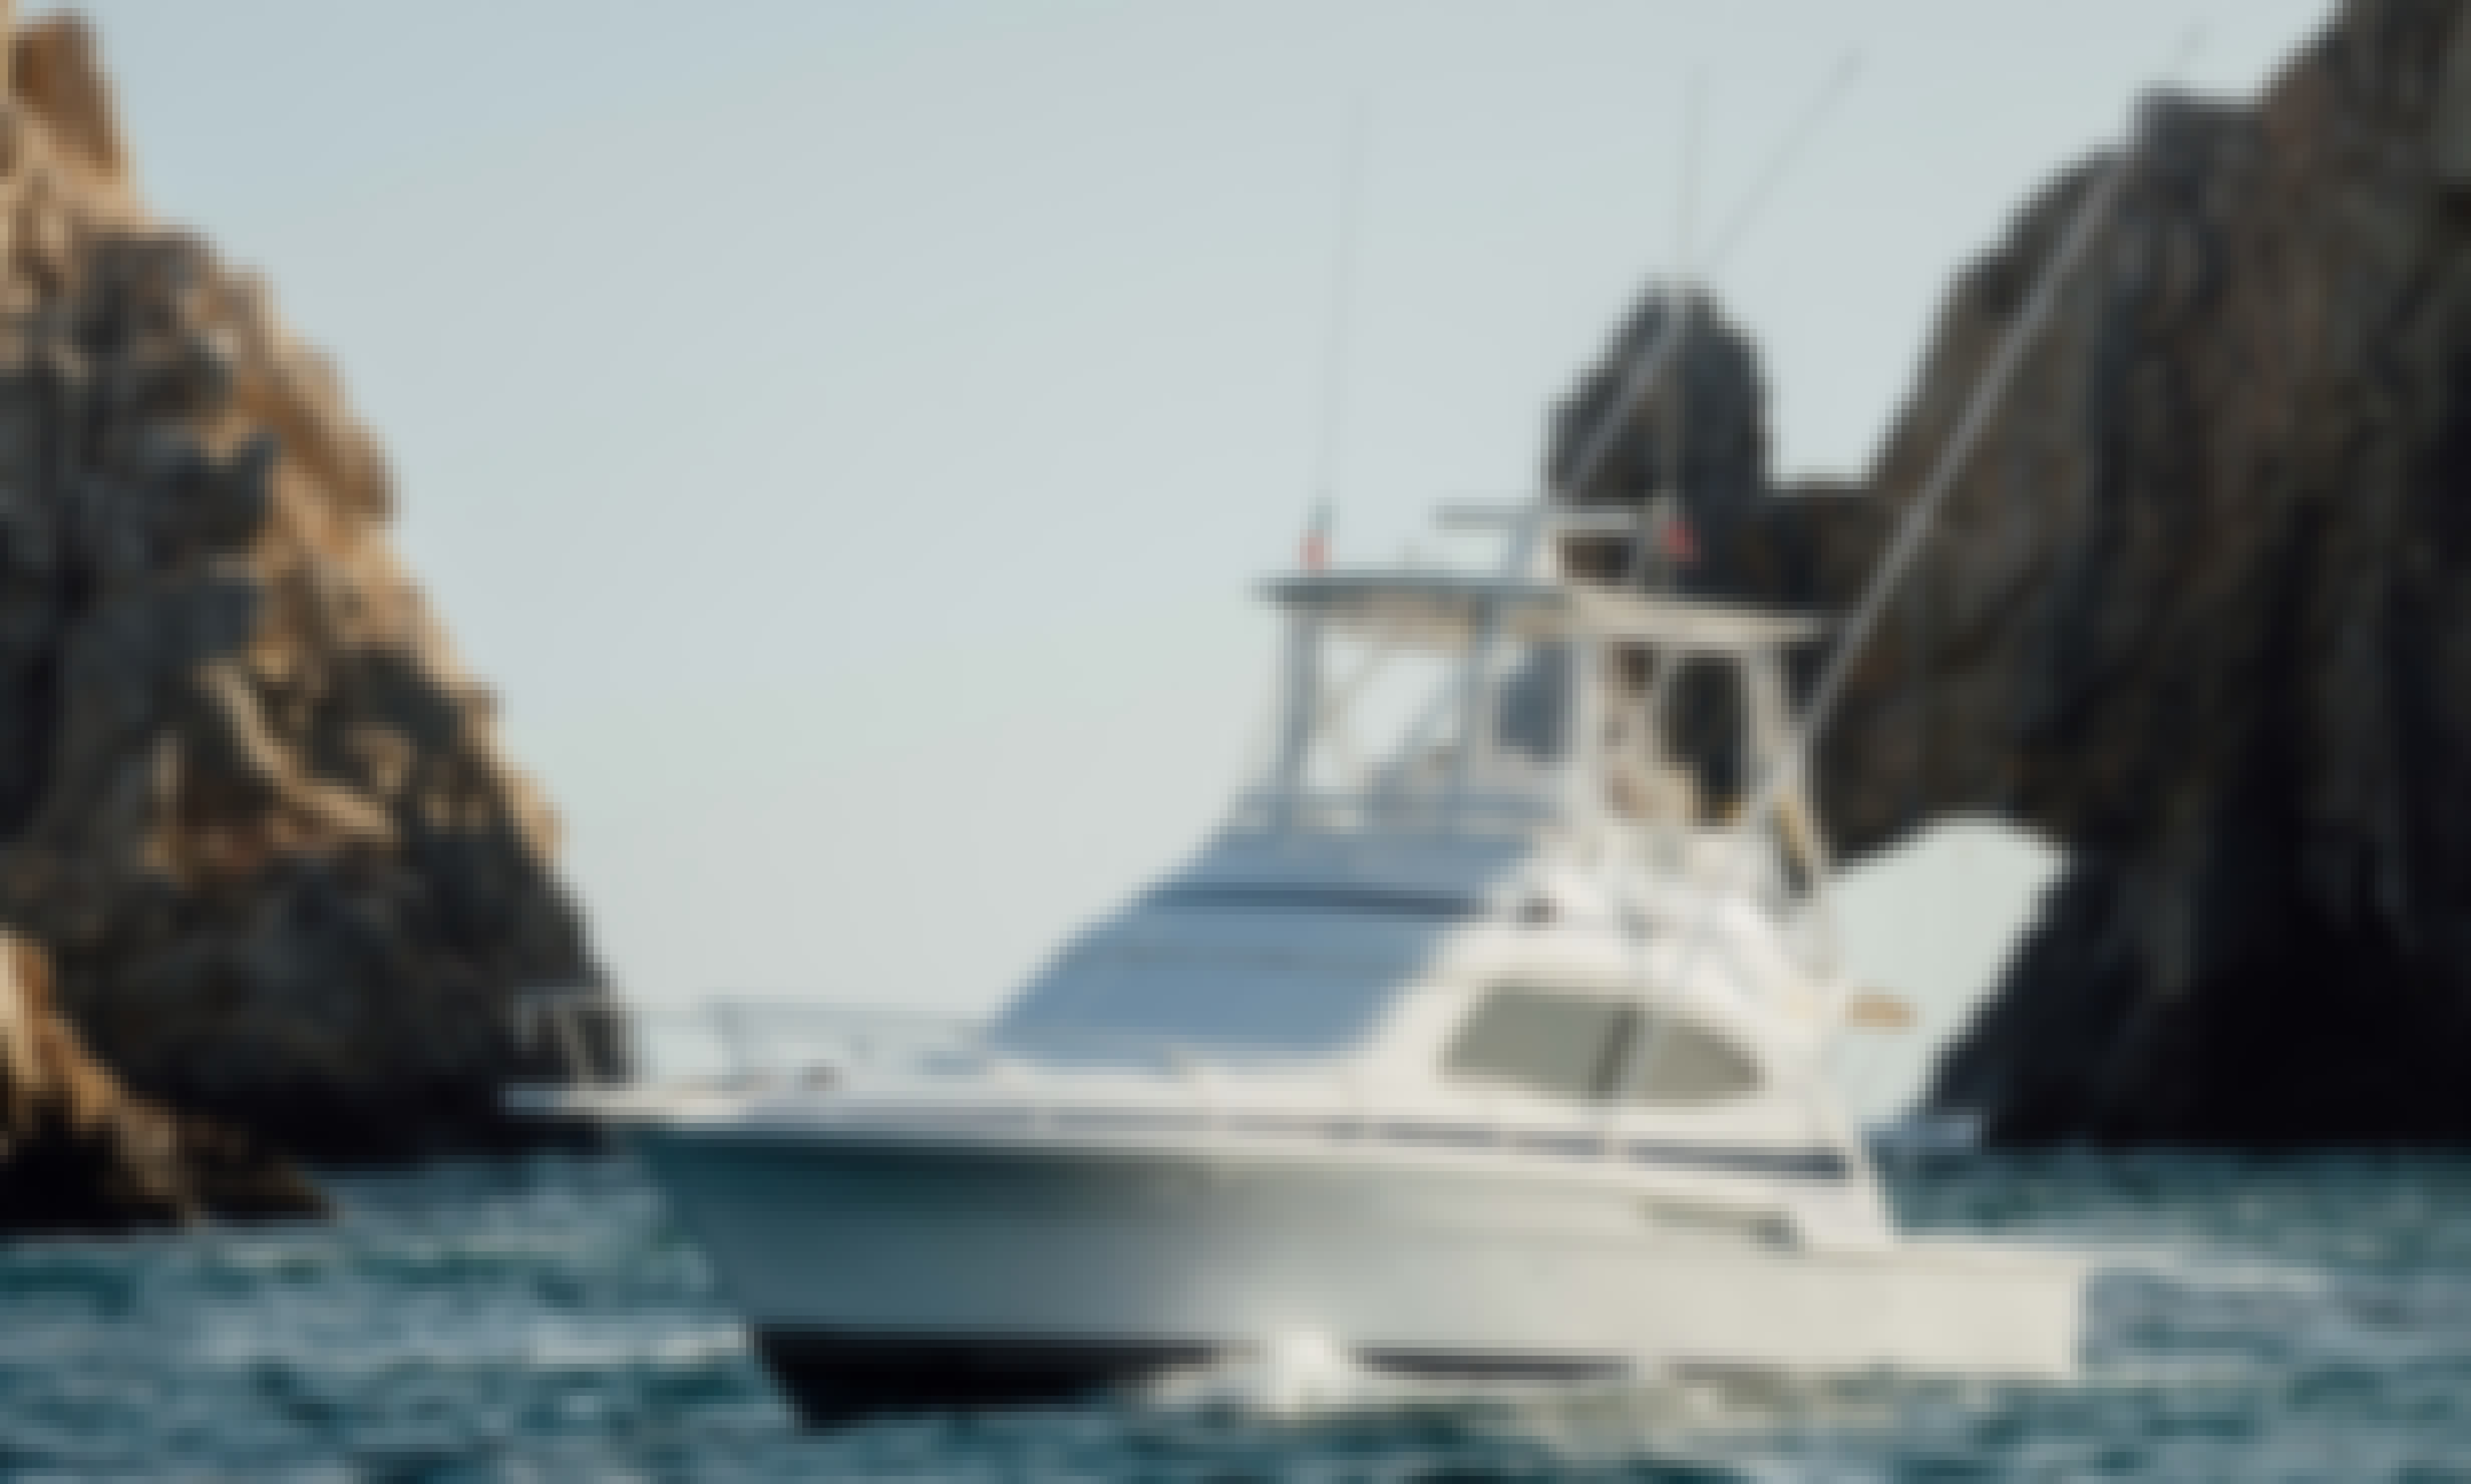 40' Bertram Falcon Sportfishing Yacht in Cabo San Lucas, Baja California Sur